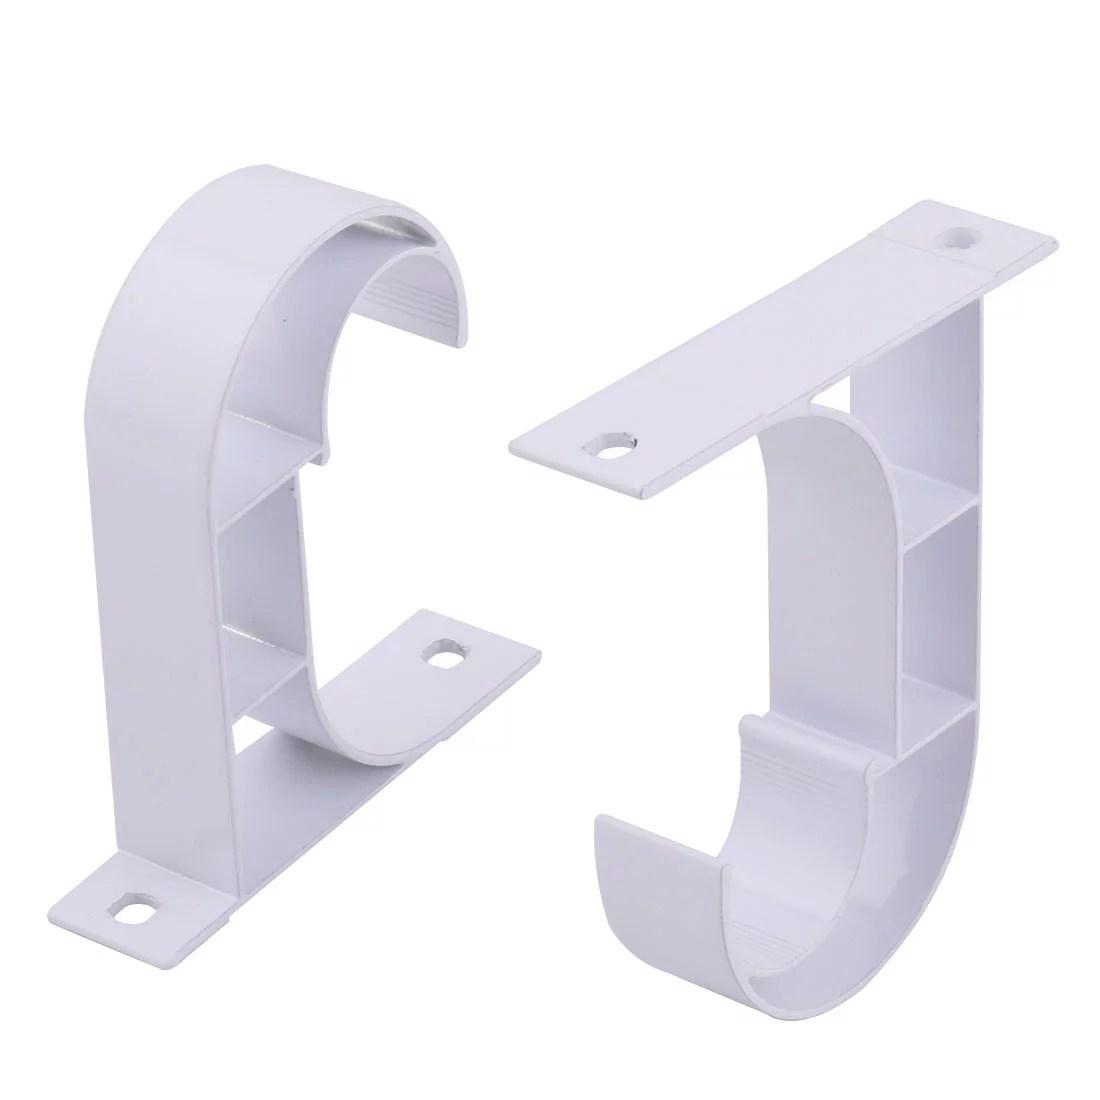 curtain rod brackets white set of 2 pvc curtain rod bracket for walls curtain rod holder